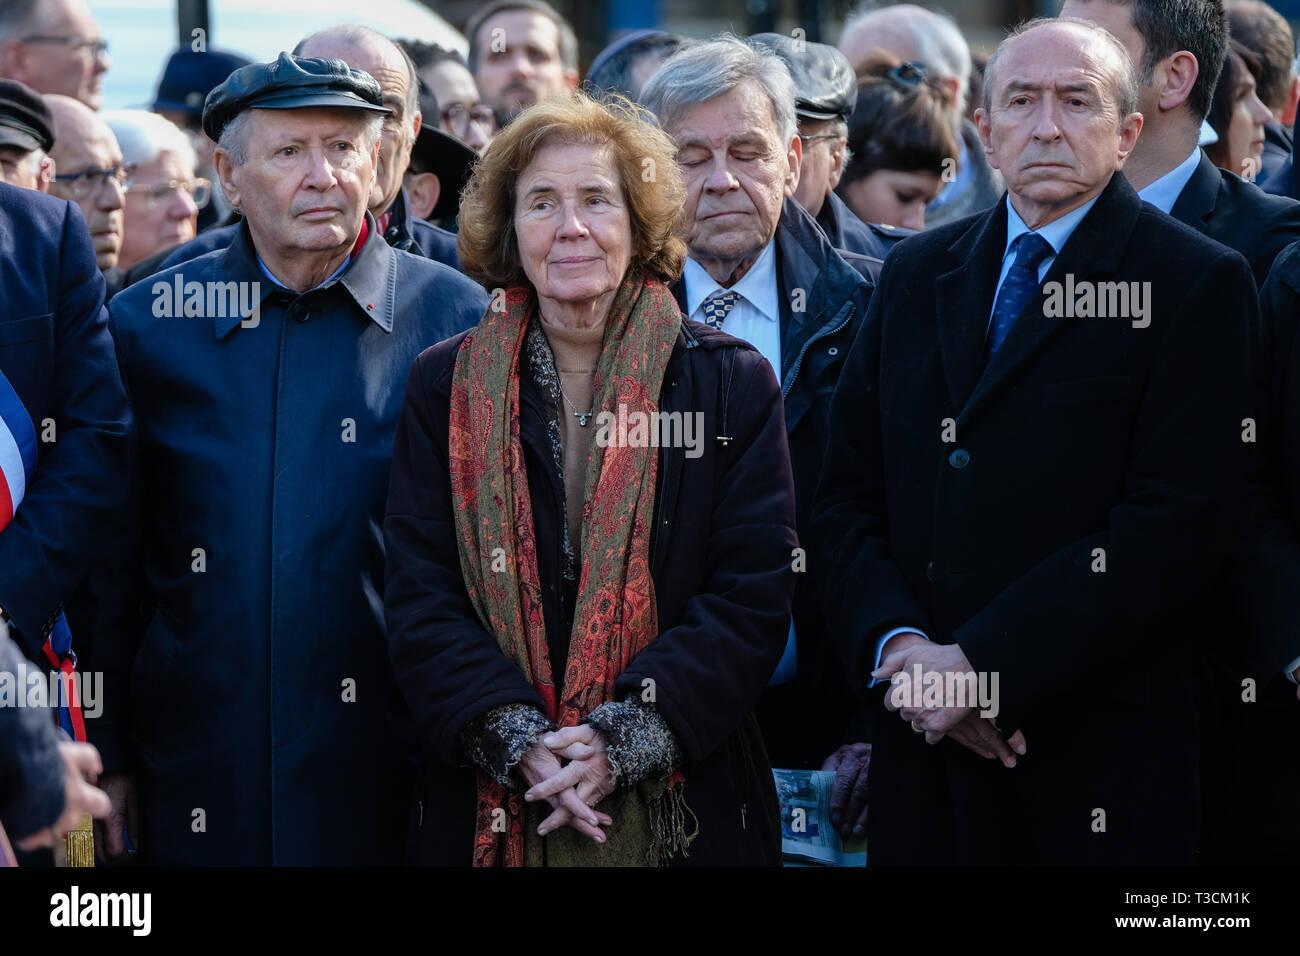 Serge et Beate Klarsfeld with Gérard Collomb the Mayor of Lyon - Stock Image